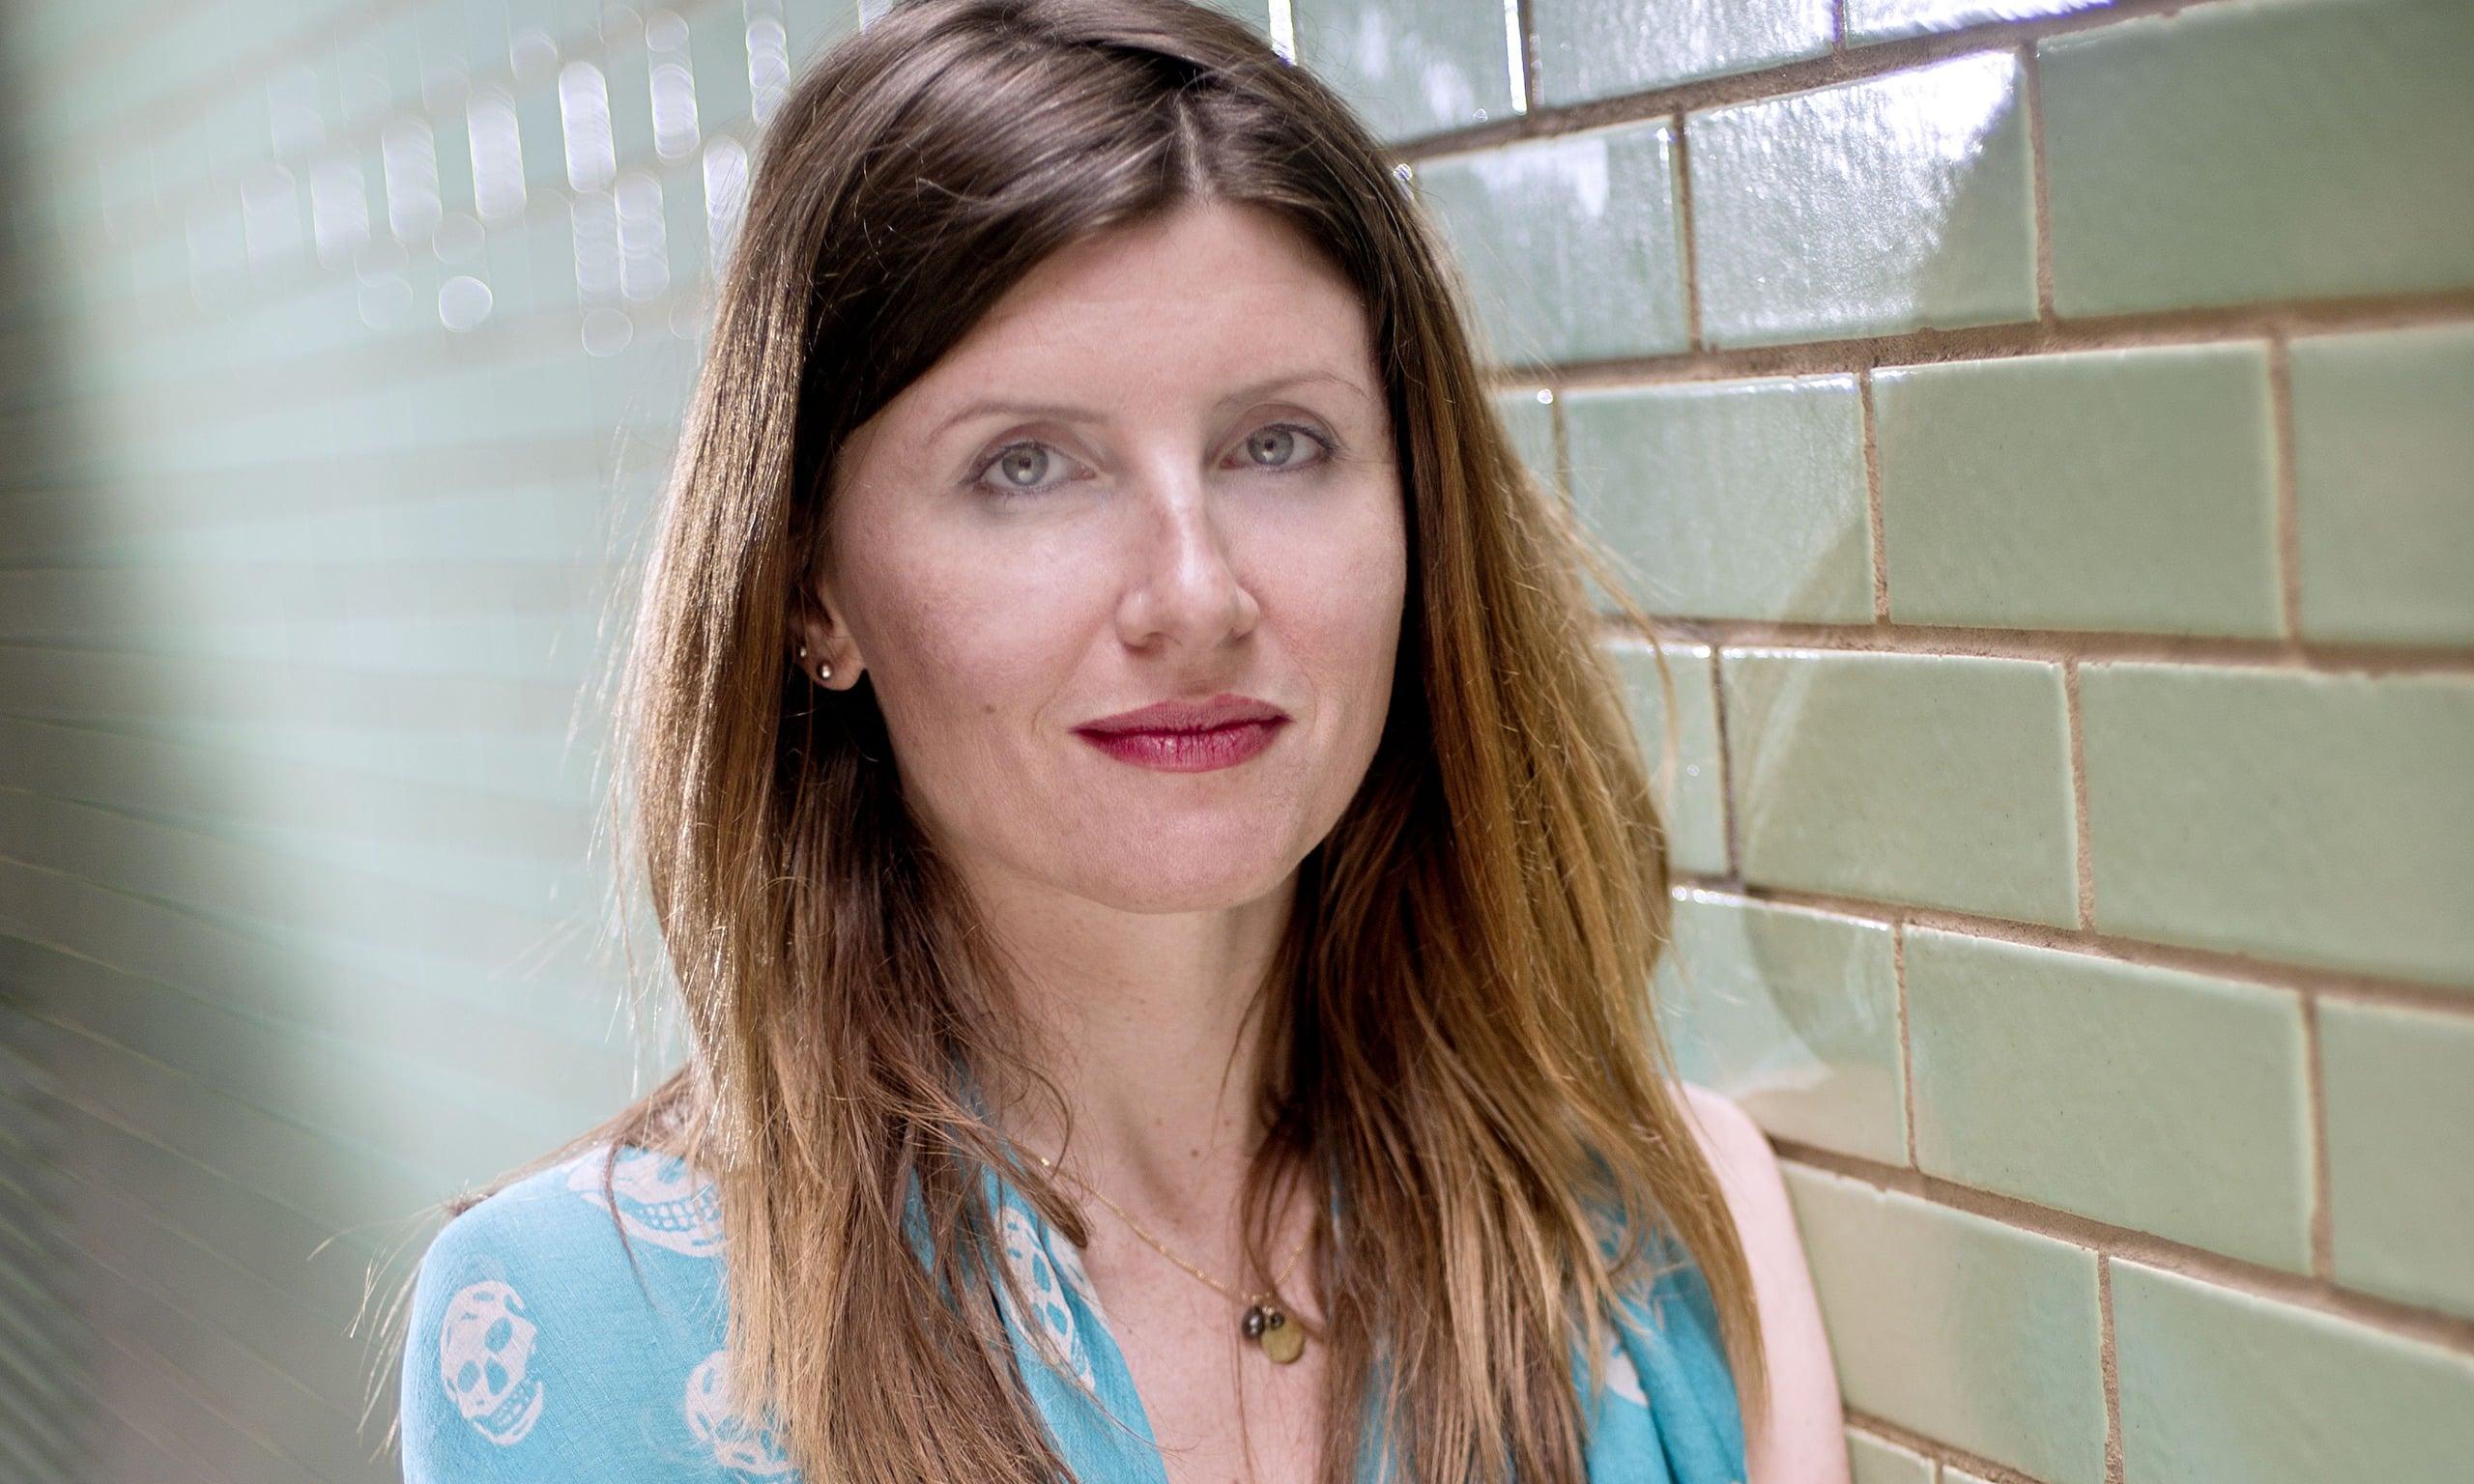 Sharon Horgan earned a  million dollar salary - leaving the net worth at 2 million in 2018